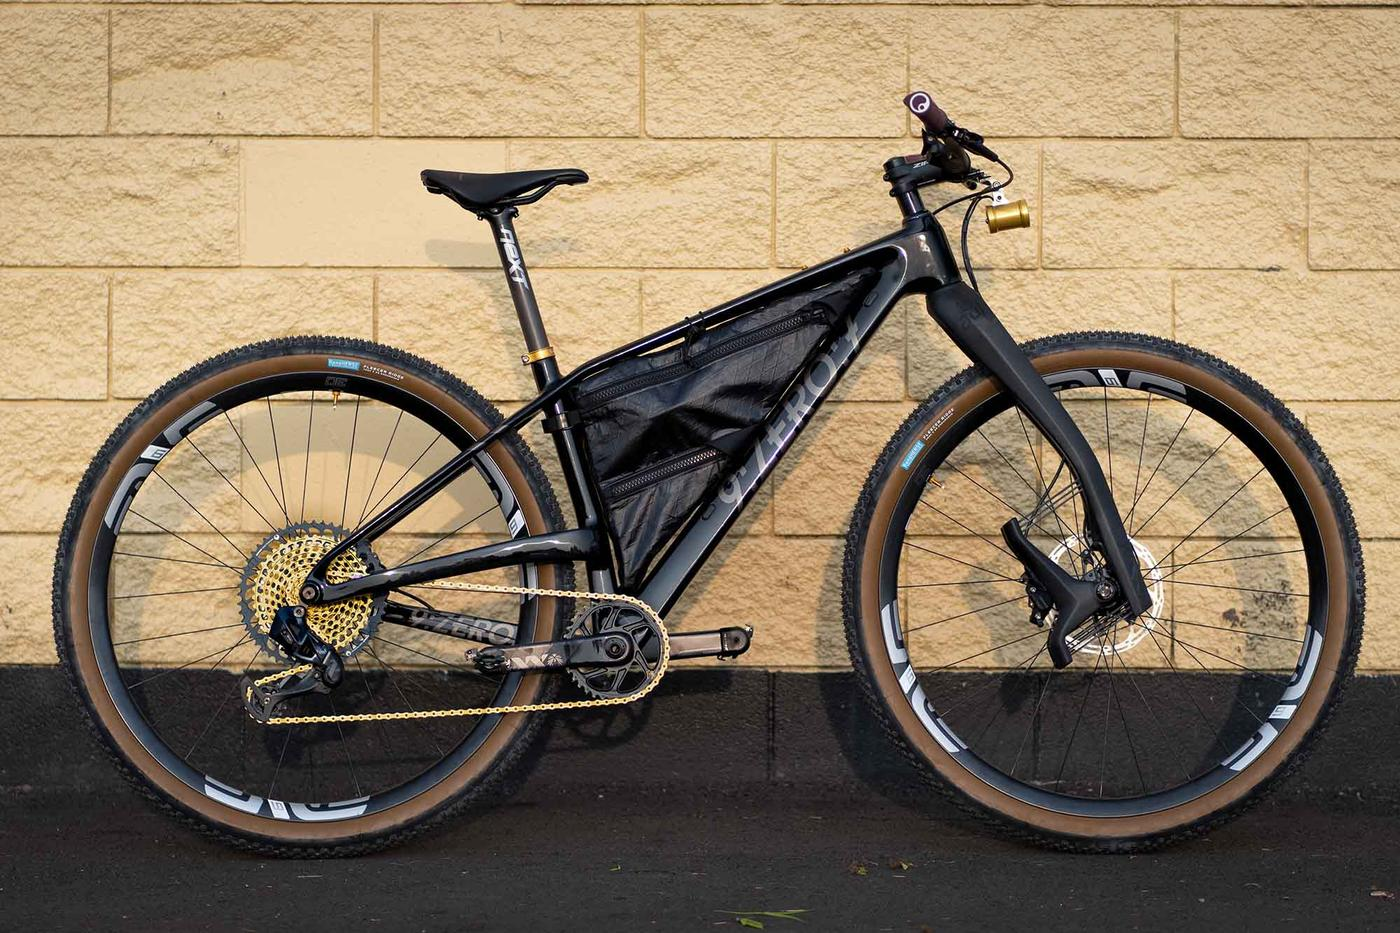 Readers' Rides: Adrian's 9zero7 Saber with a Lauf Fork